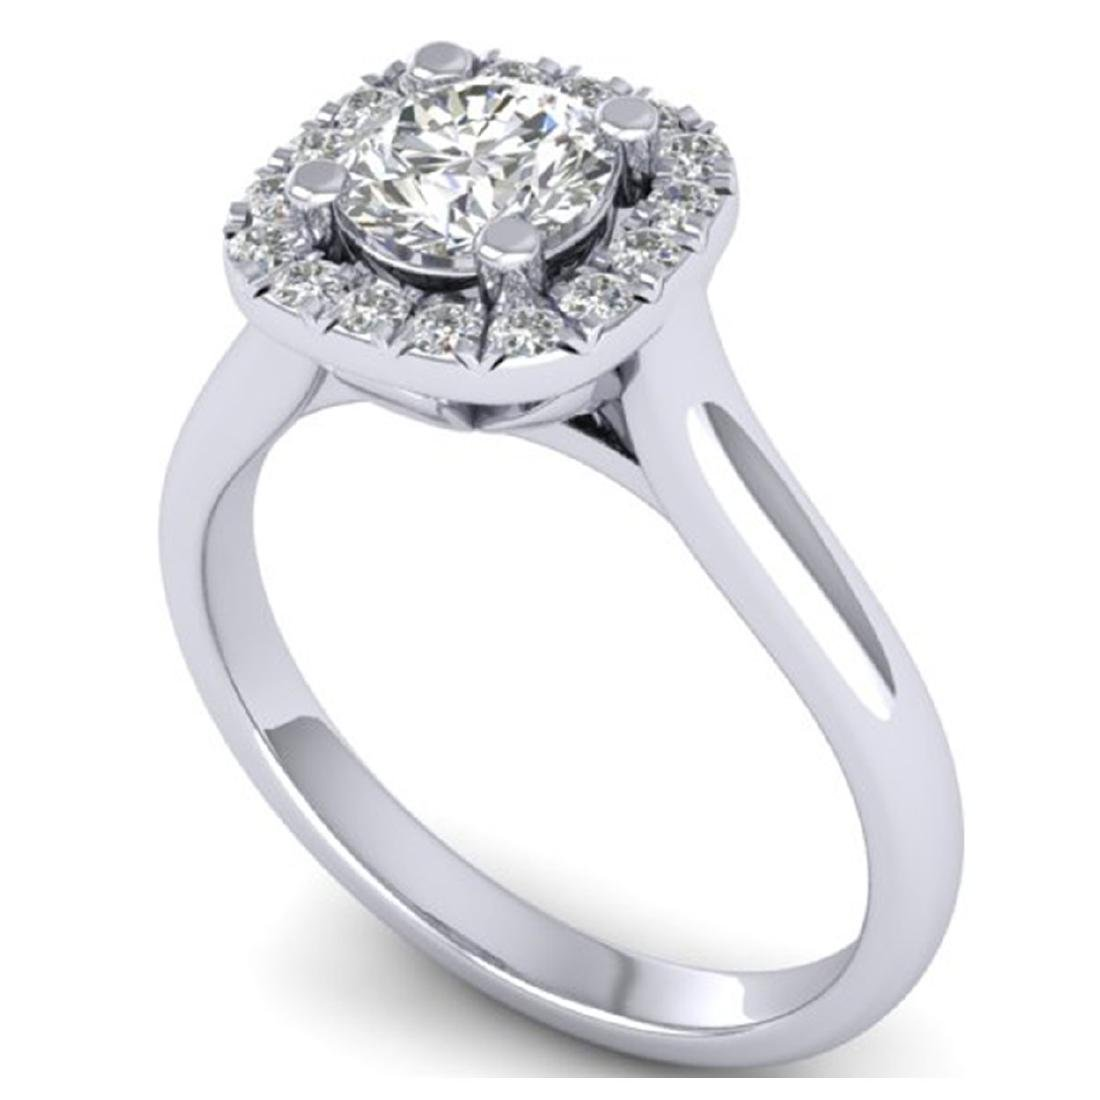 1.01 ctw VS/SI Diamond Solitaire Halo Ring 18K White - 2